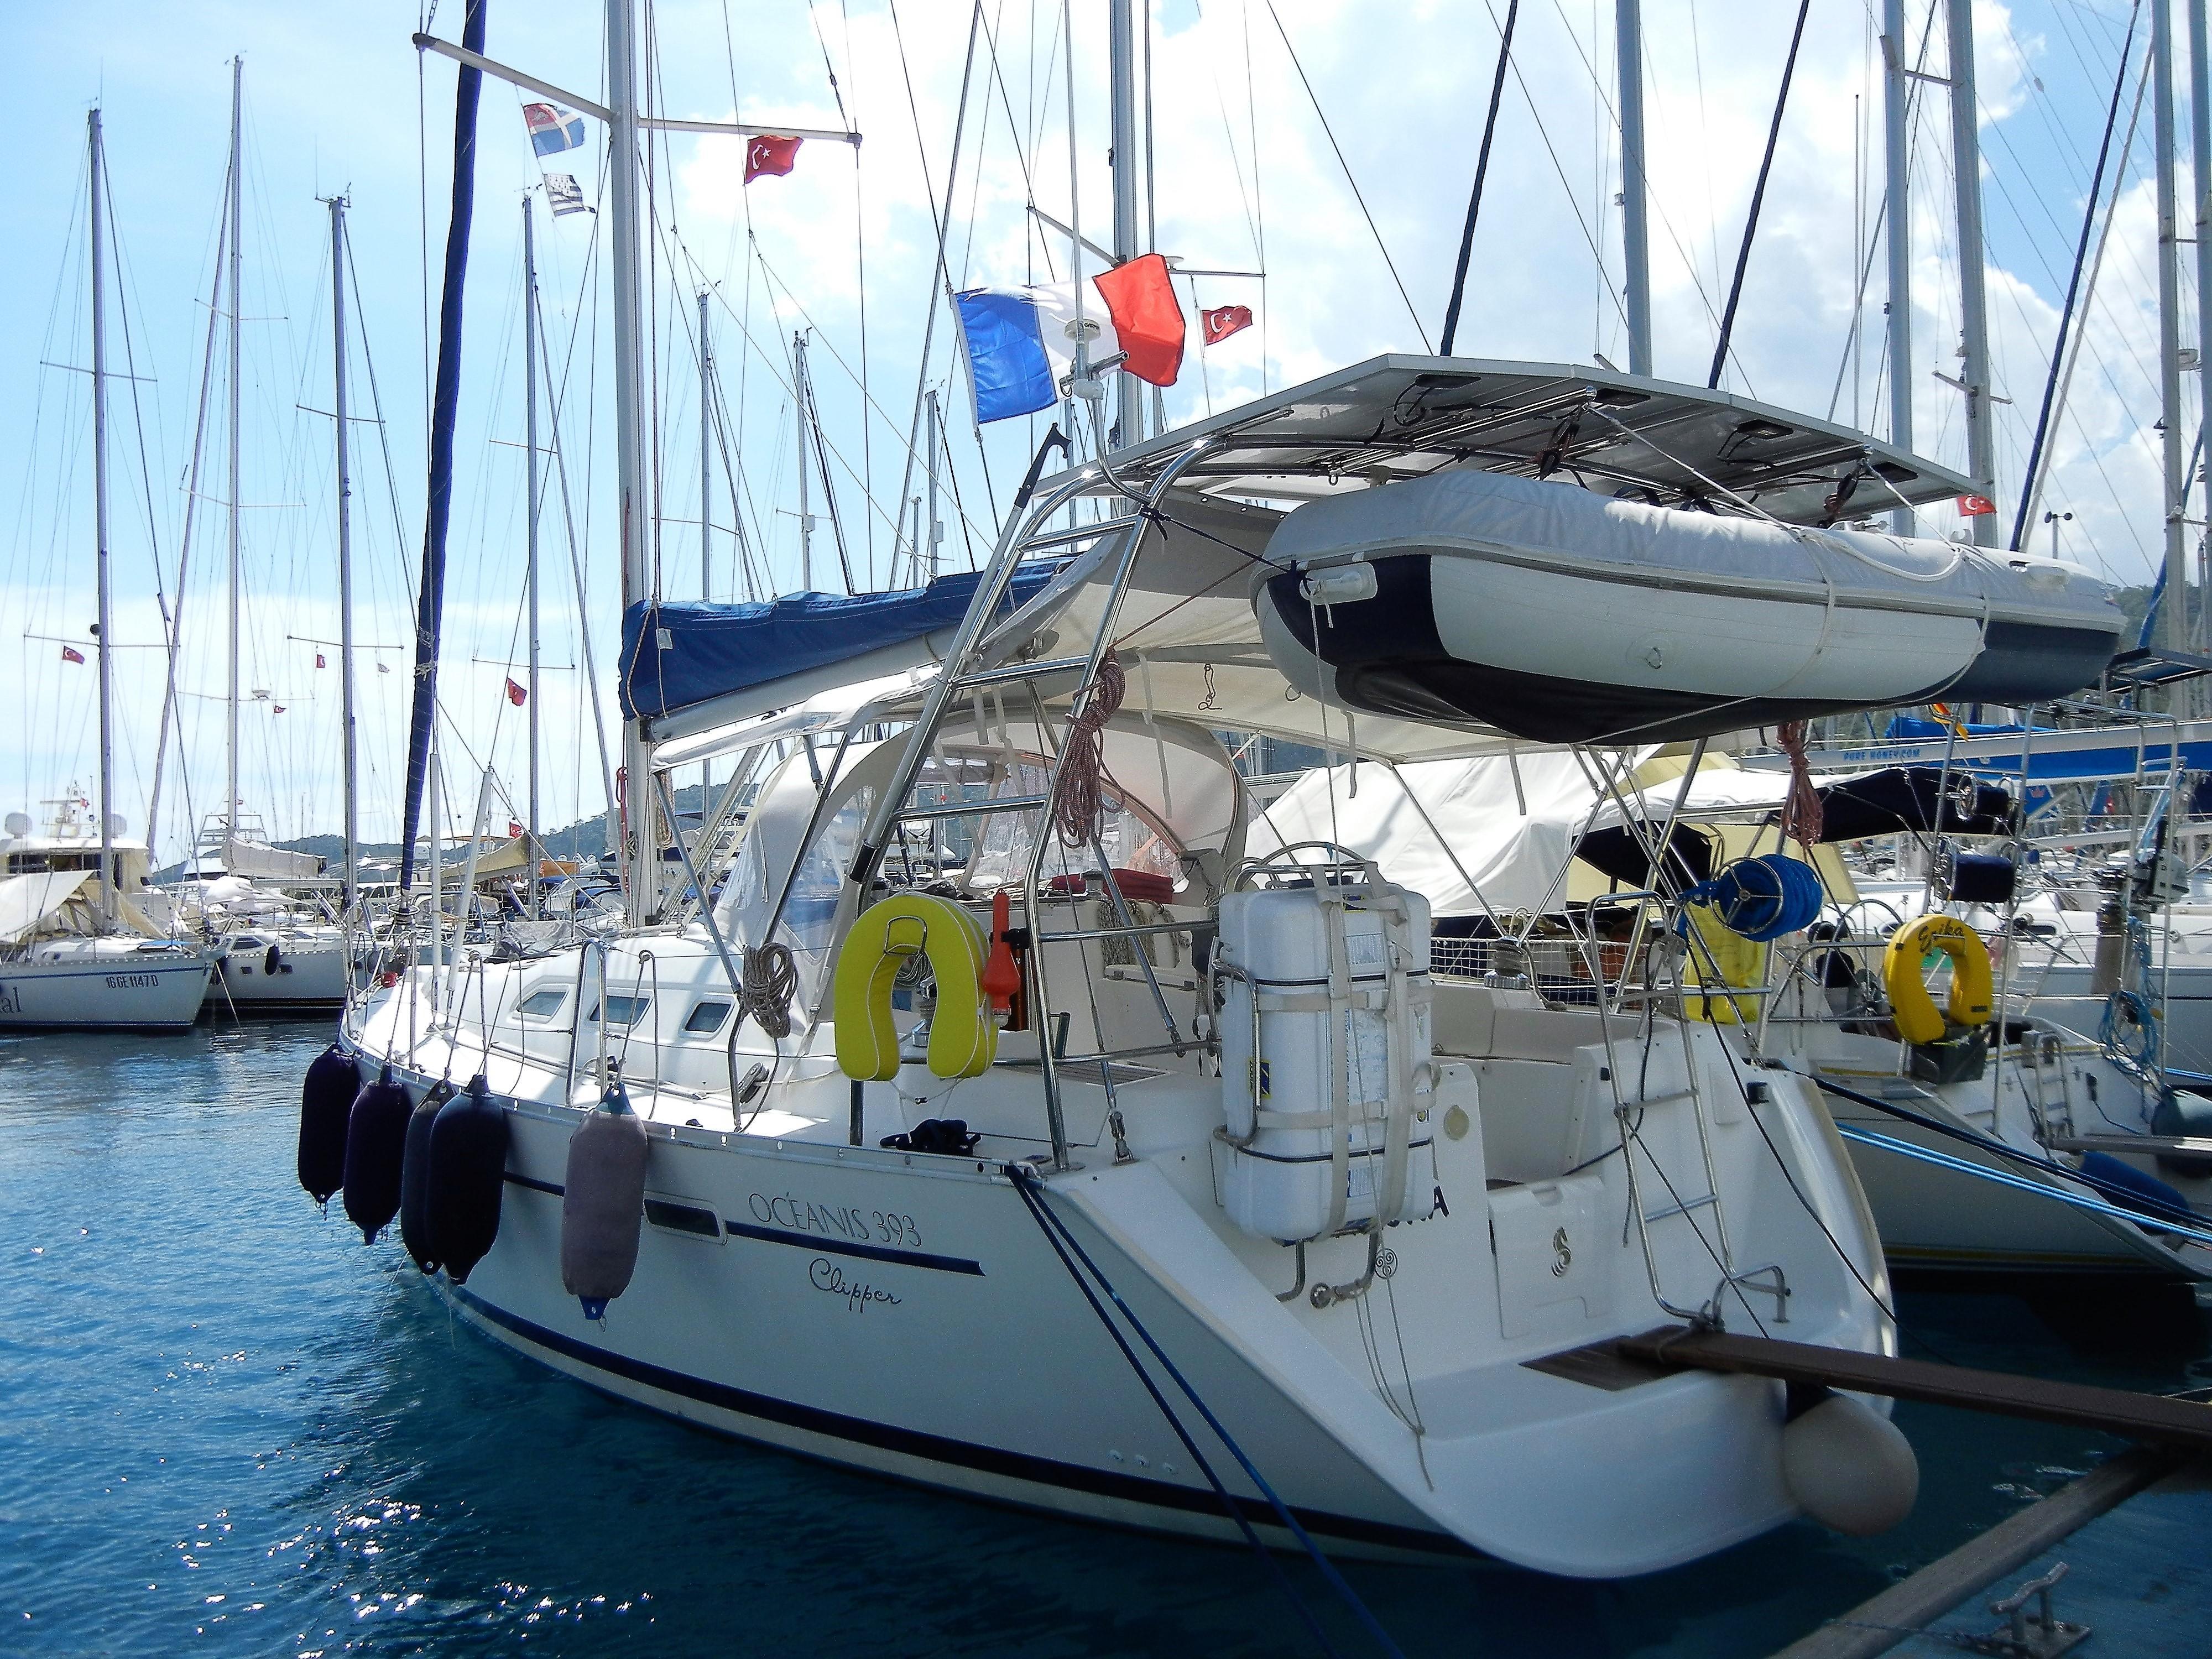 Beneteau Oceanis 393 Boat For Sale